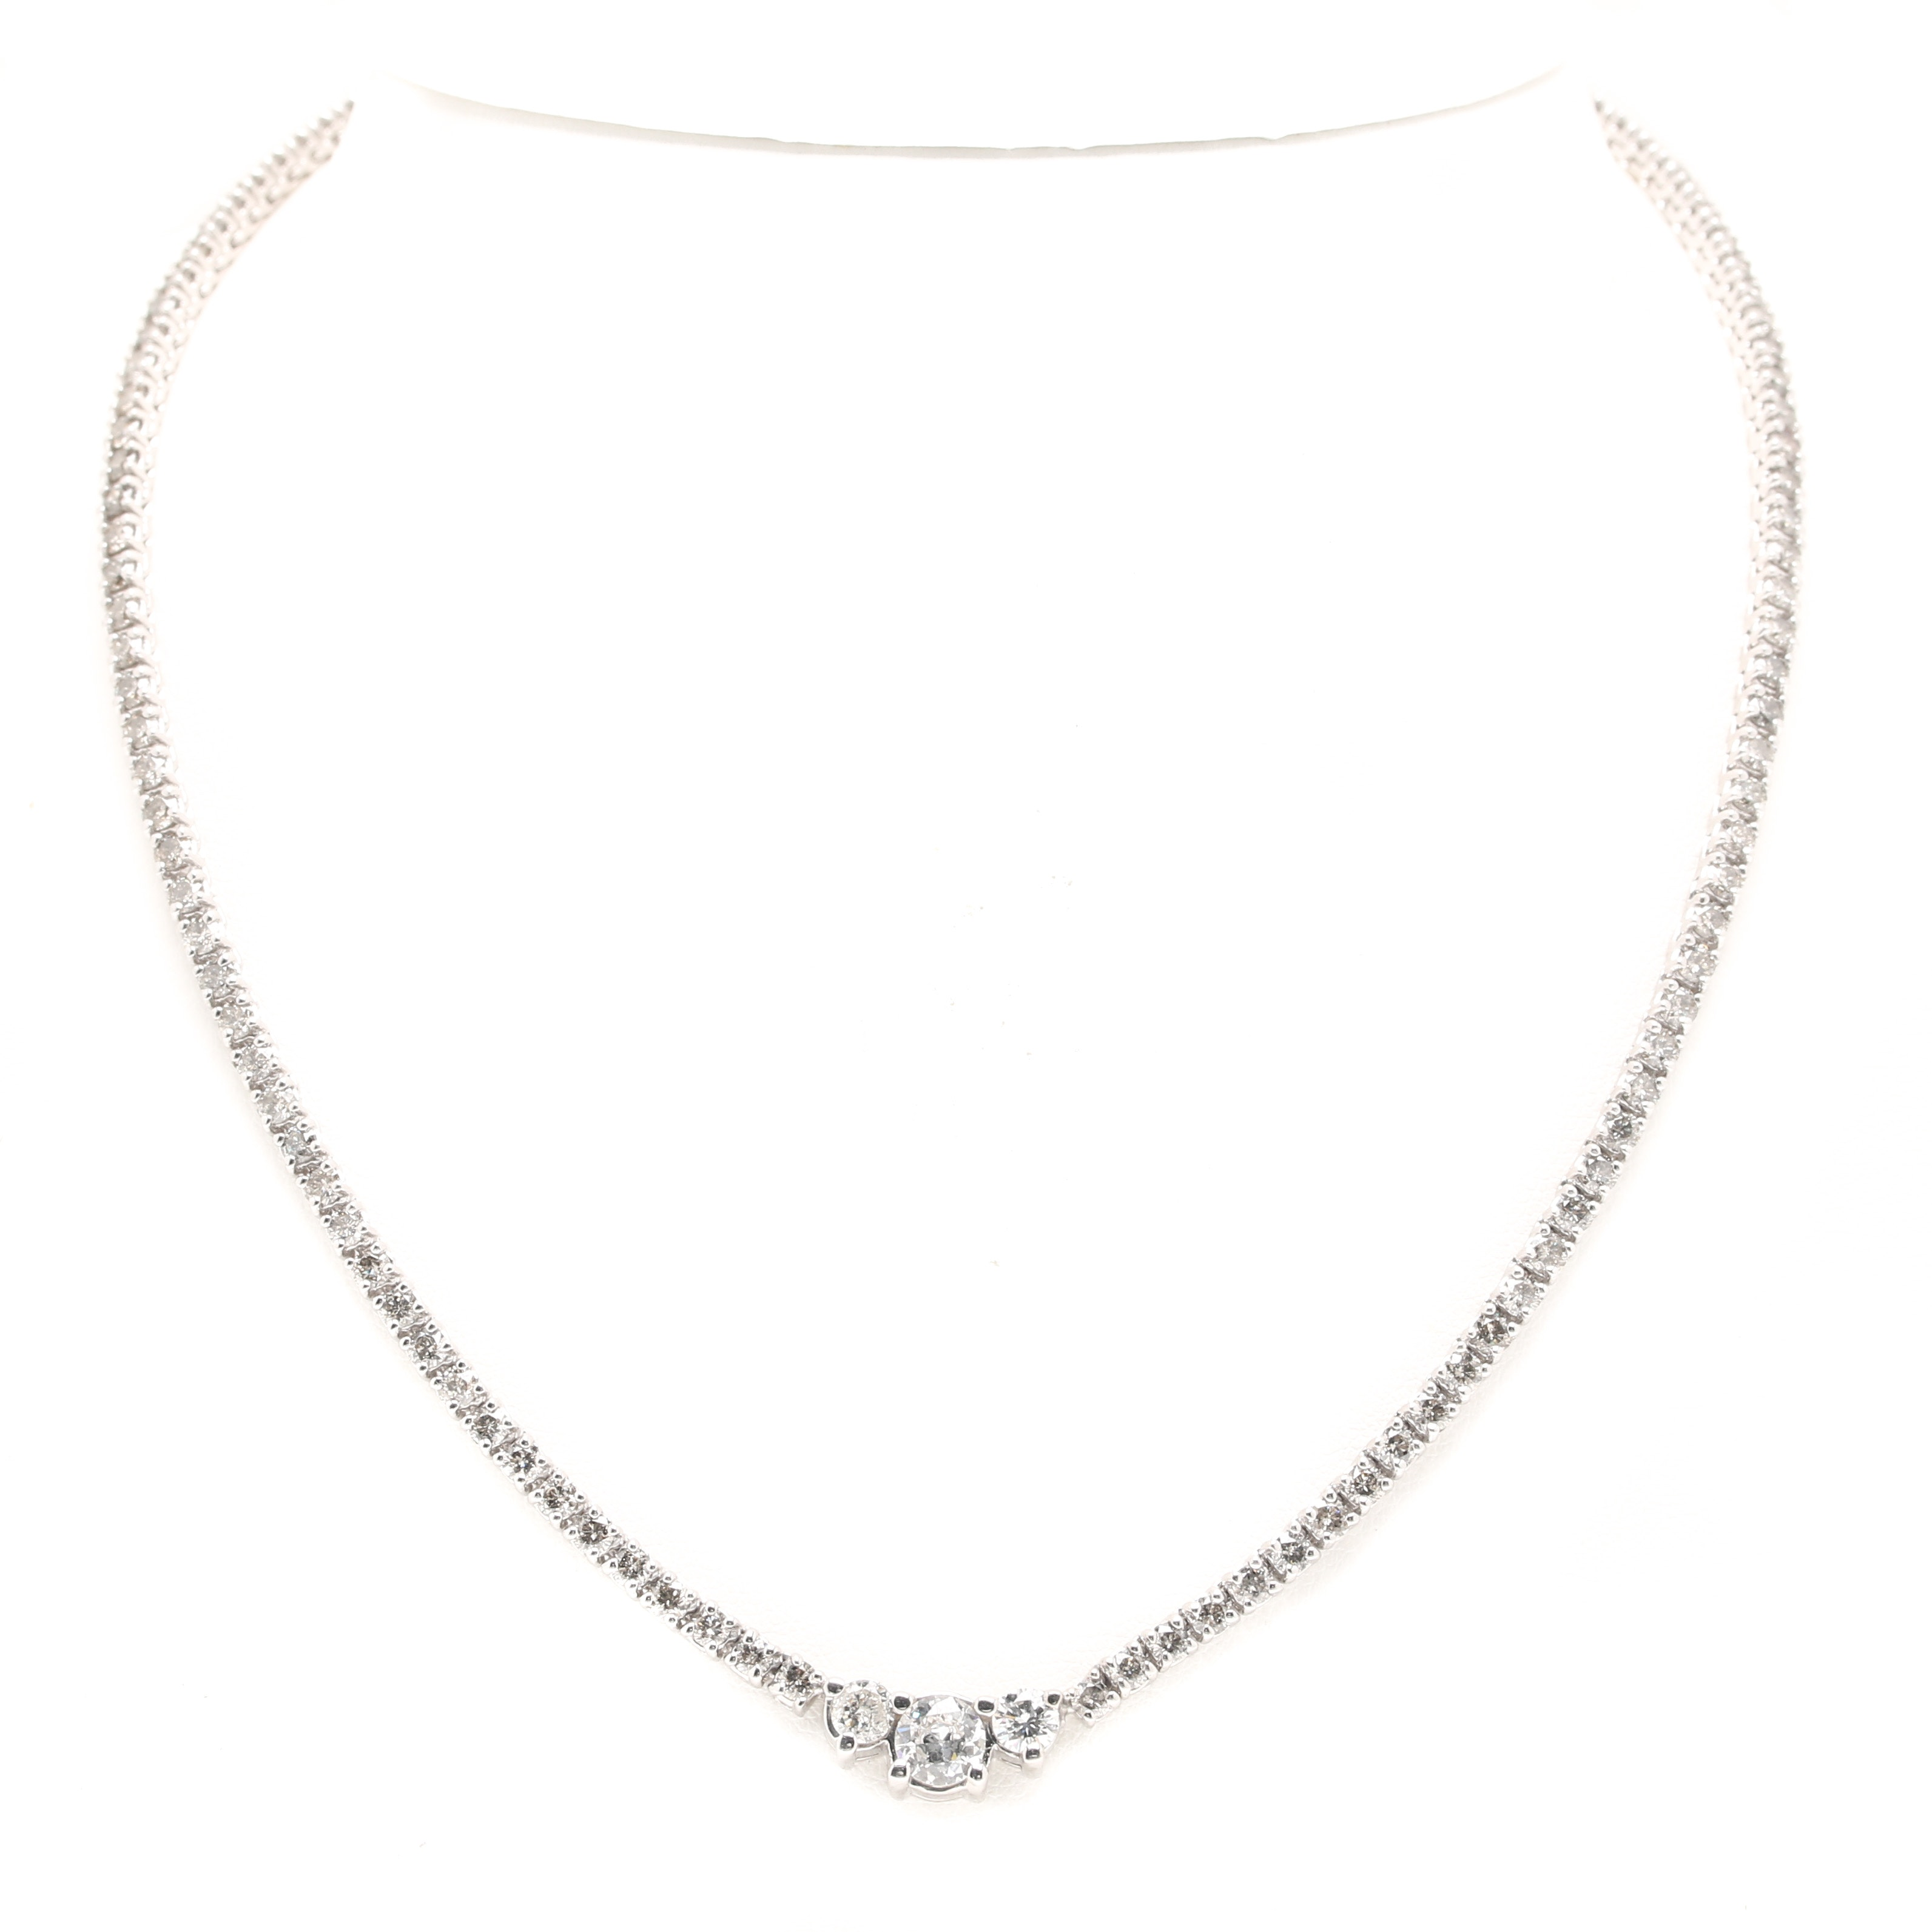 14K White Gold 8.47 CTW Diamond Necklace